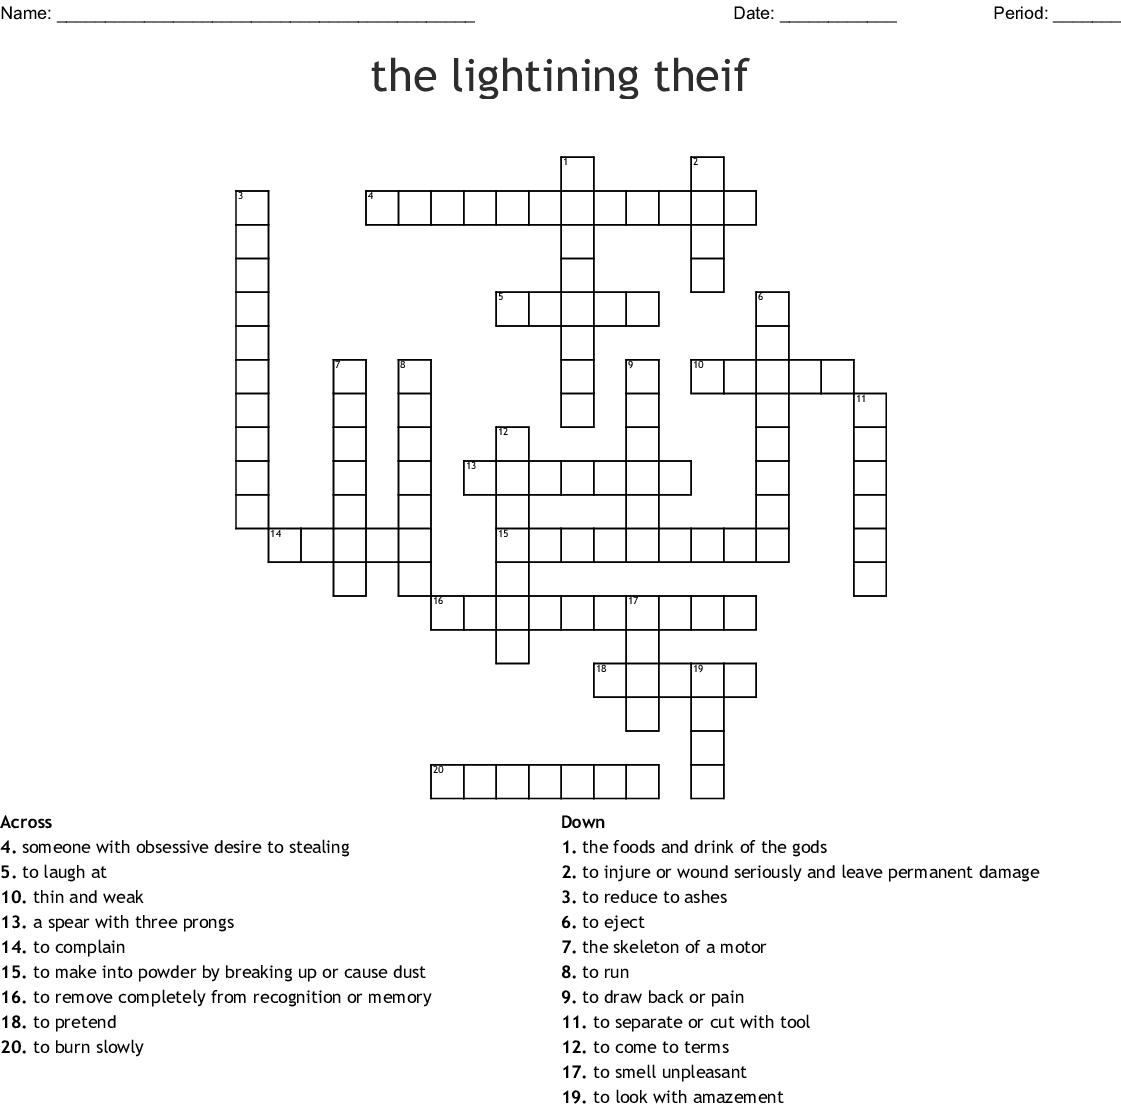 The Lightning Thief Crossword Puzzle   WordMint